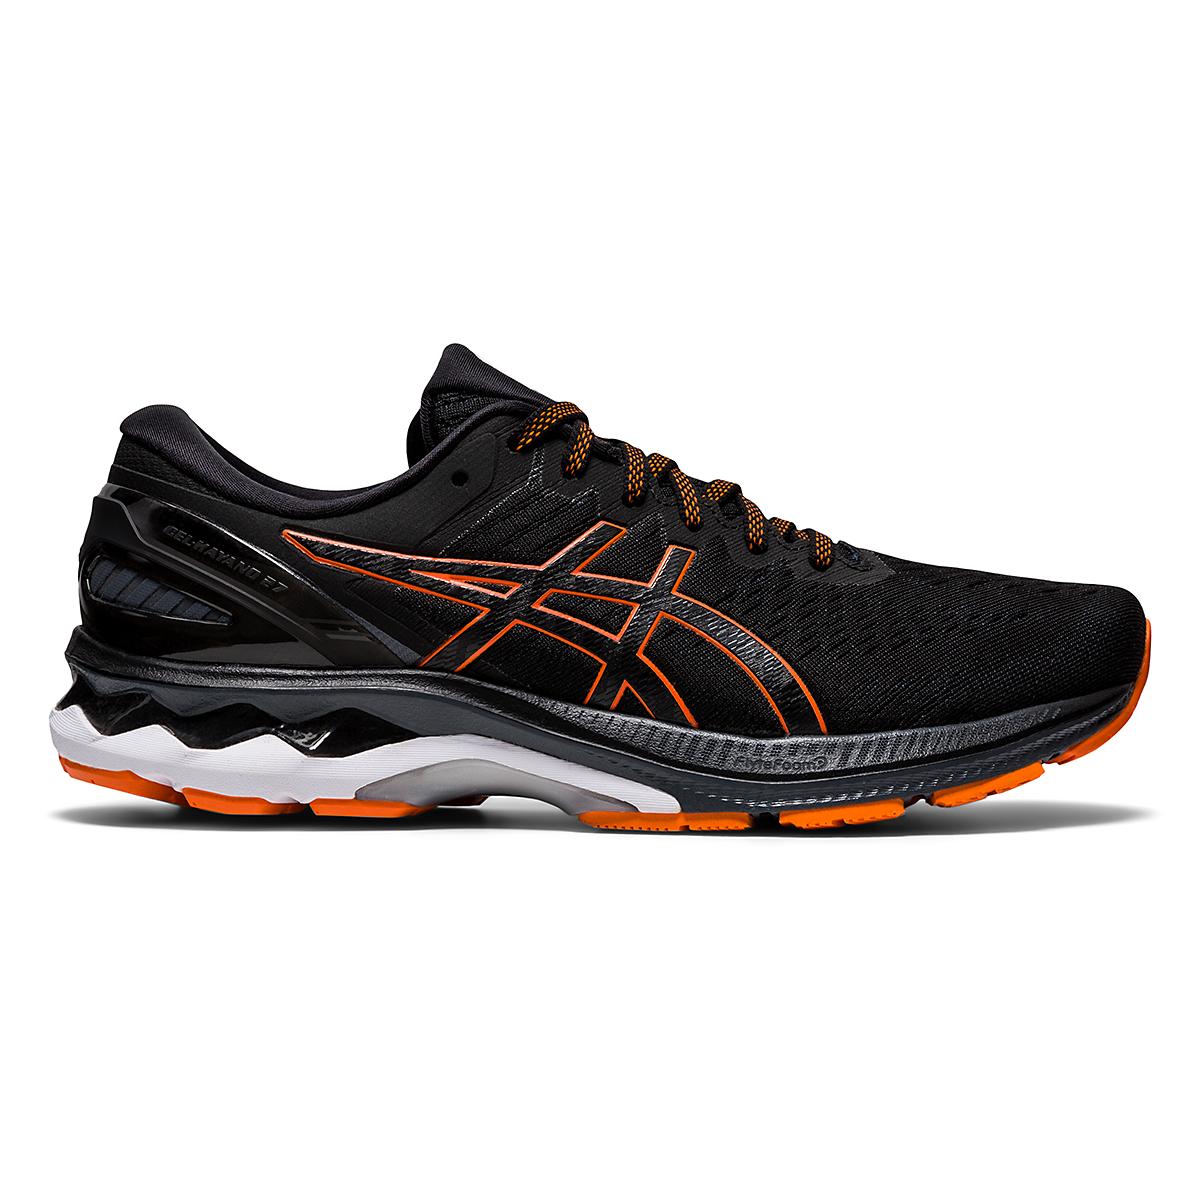 Men's Asics GEL-Kayano 27 Running Shoe - Color: Black/Marigold - Size: 7.5 - Width: Regular, Black/Marigold, large, image 1